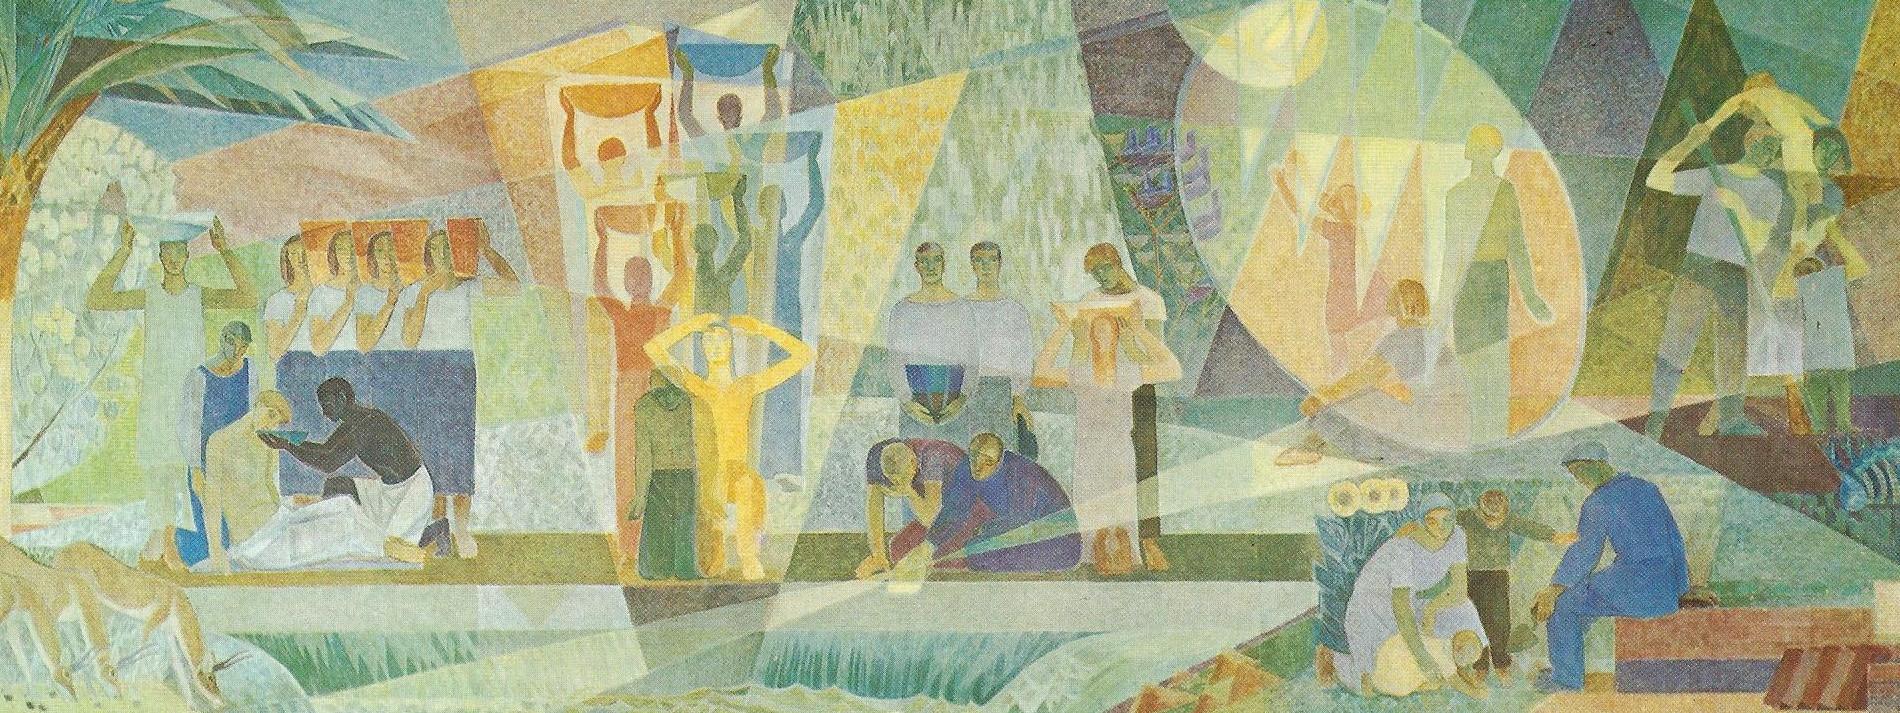 Lennart Segerstrale At the spring of life fresco